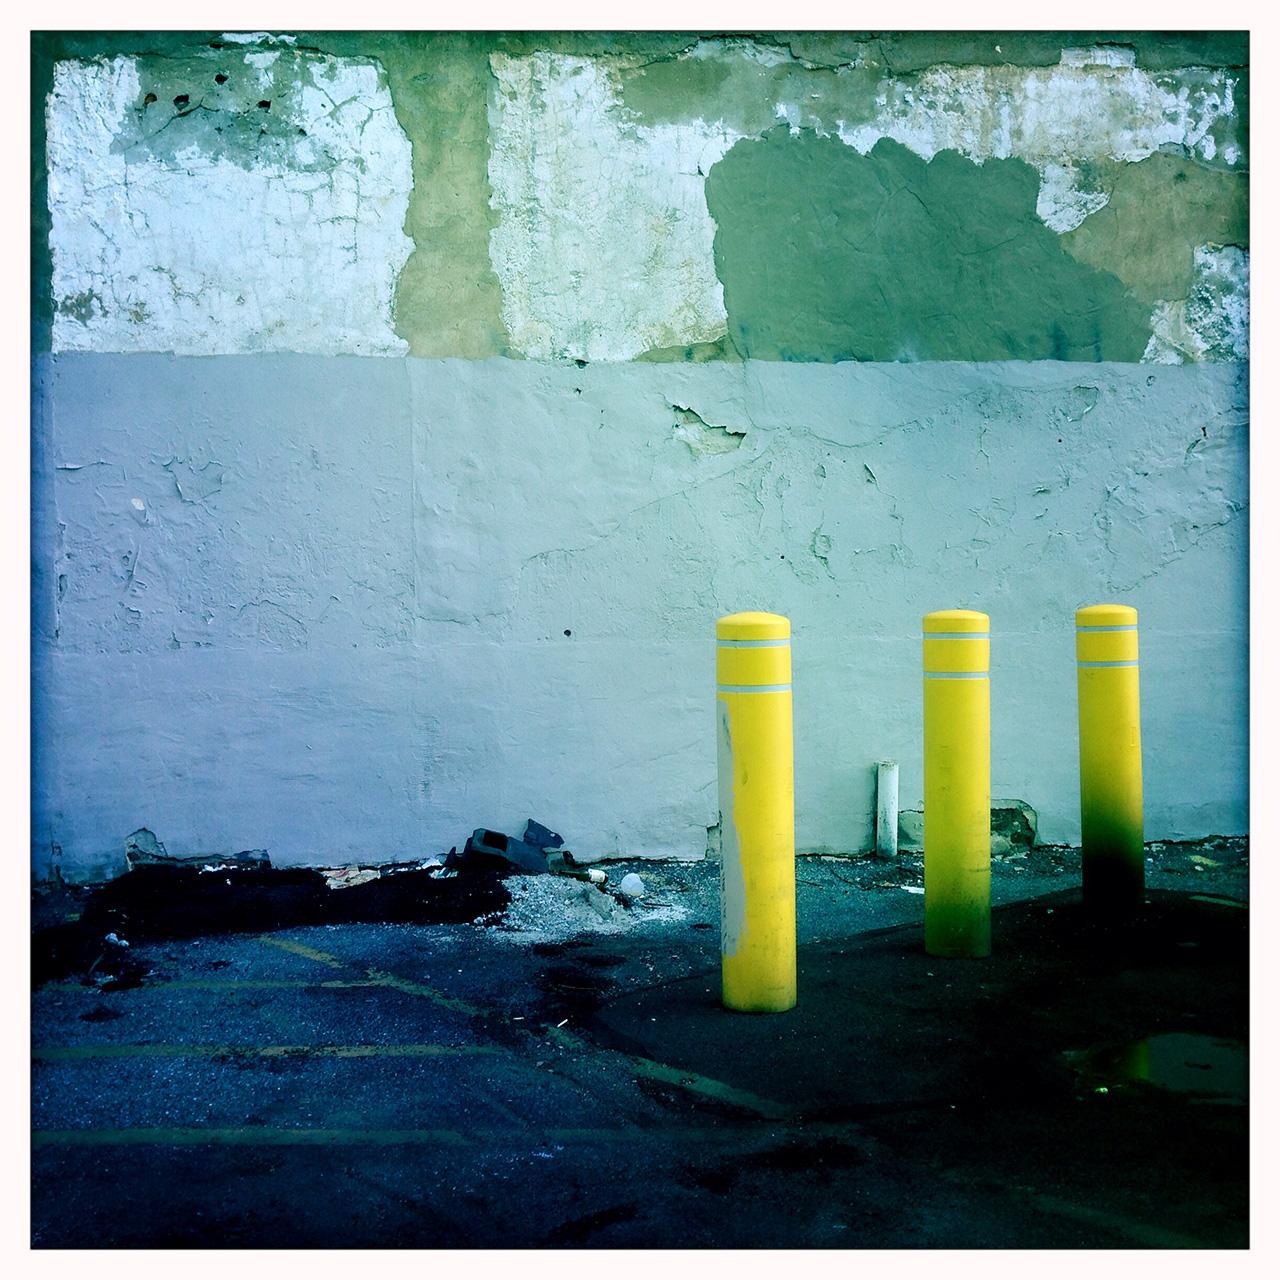 yellowpoles